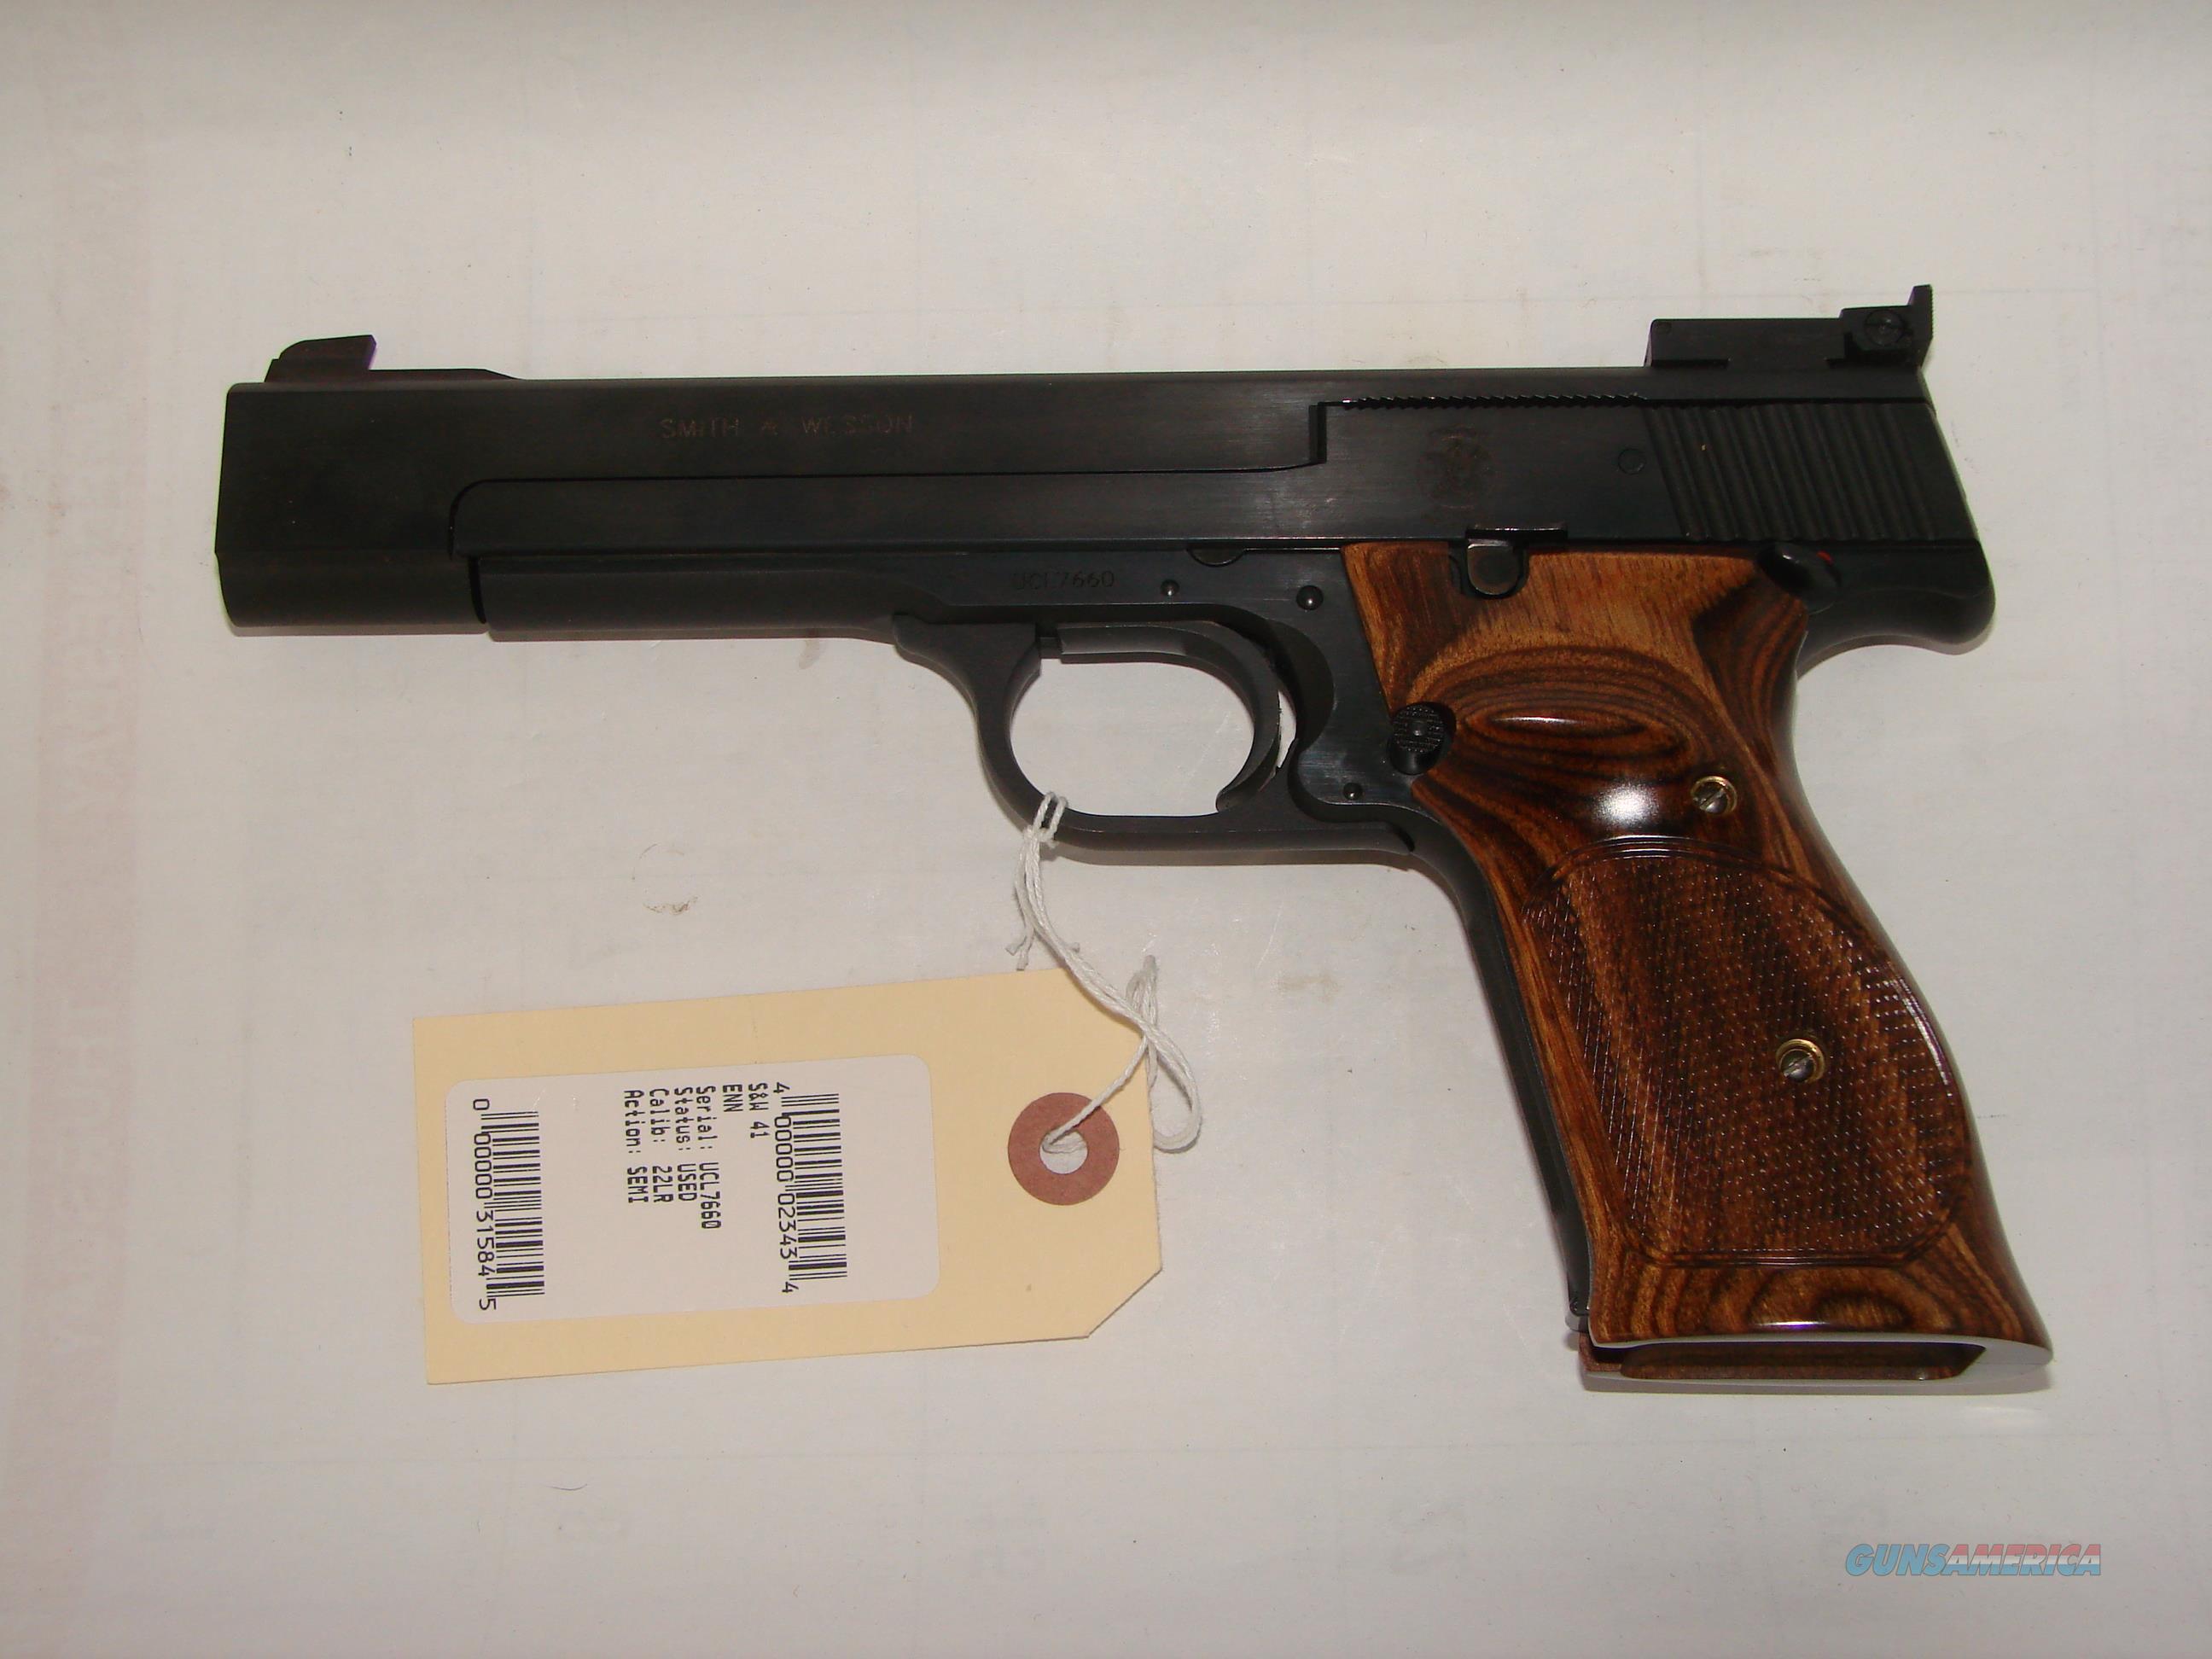 S&W 41  Guns > Pistols > Smith & Wesson Pistols - Autos > .22 Autos